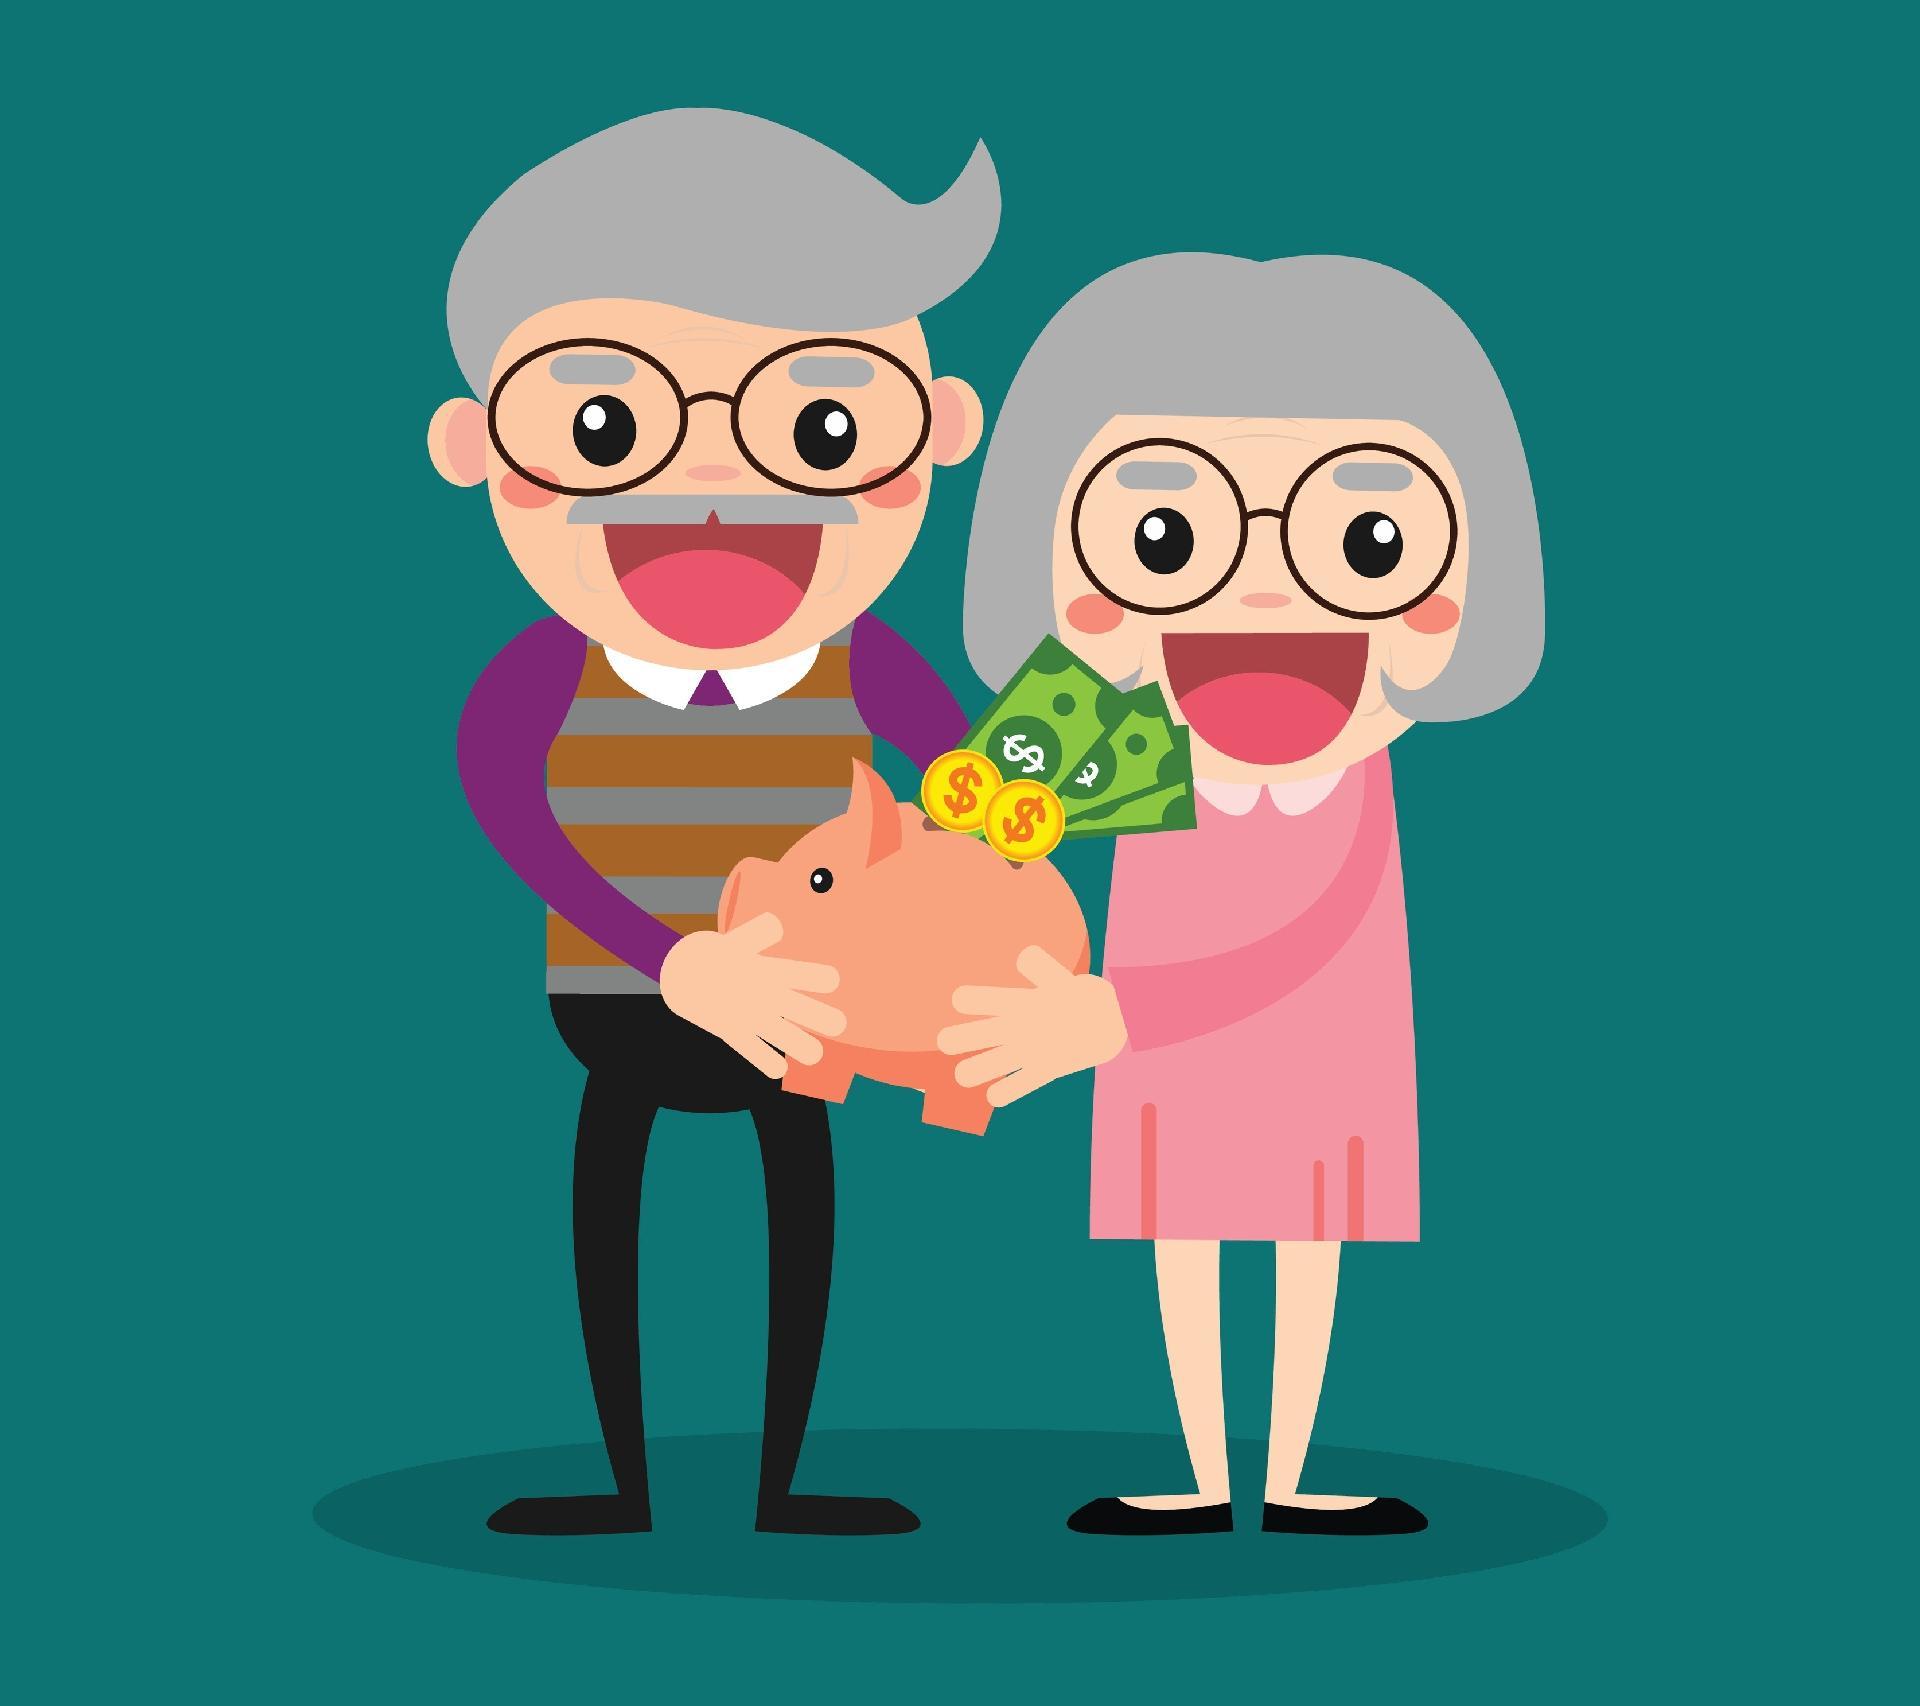 dinheiro aposentadoria aposentado previdencia inss 1506718886893 v2 1920x1706 - REVISÃO DA APOSENTADORIA - REVISÃO DA VIDA TODA